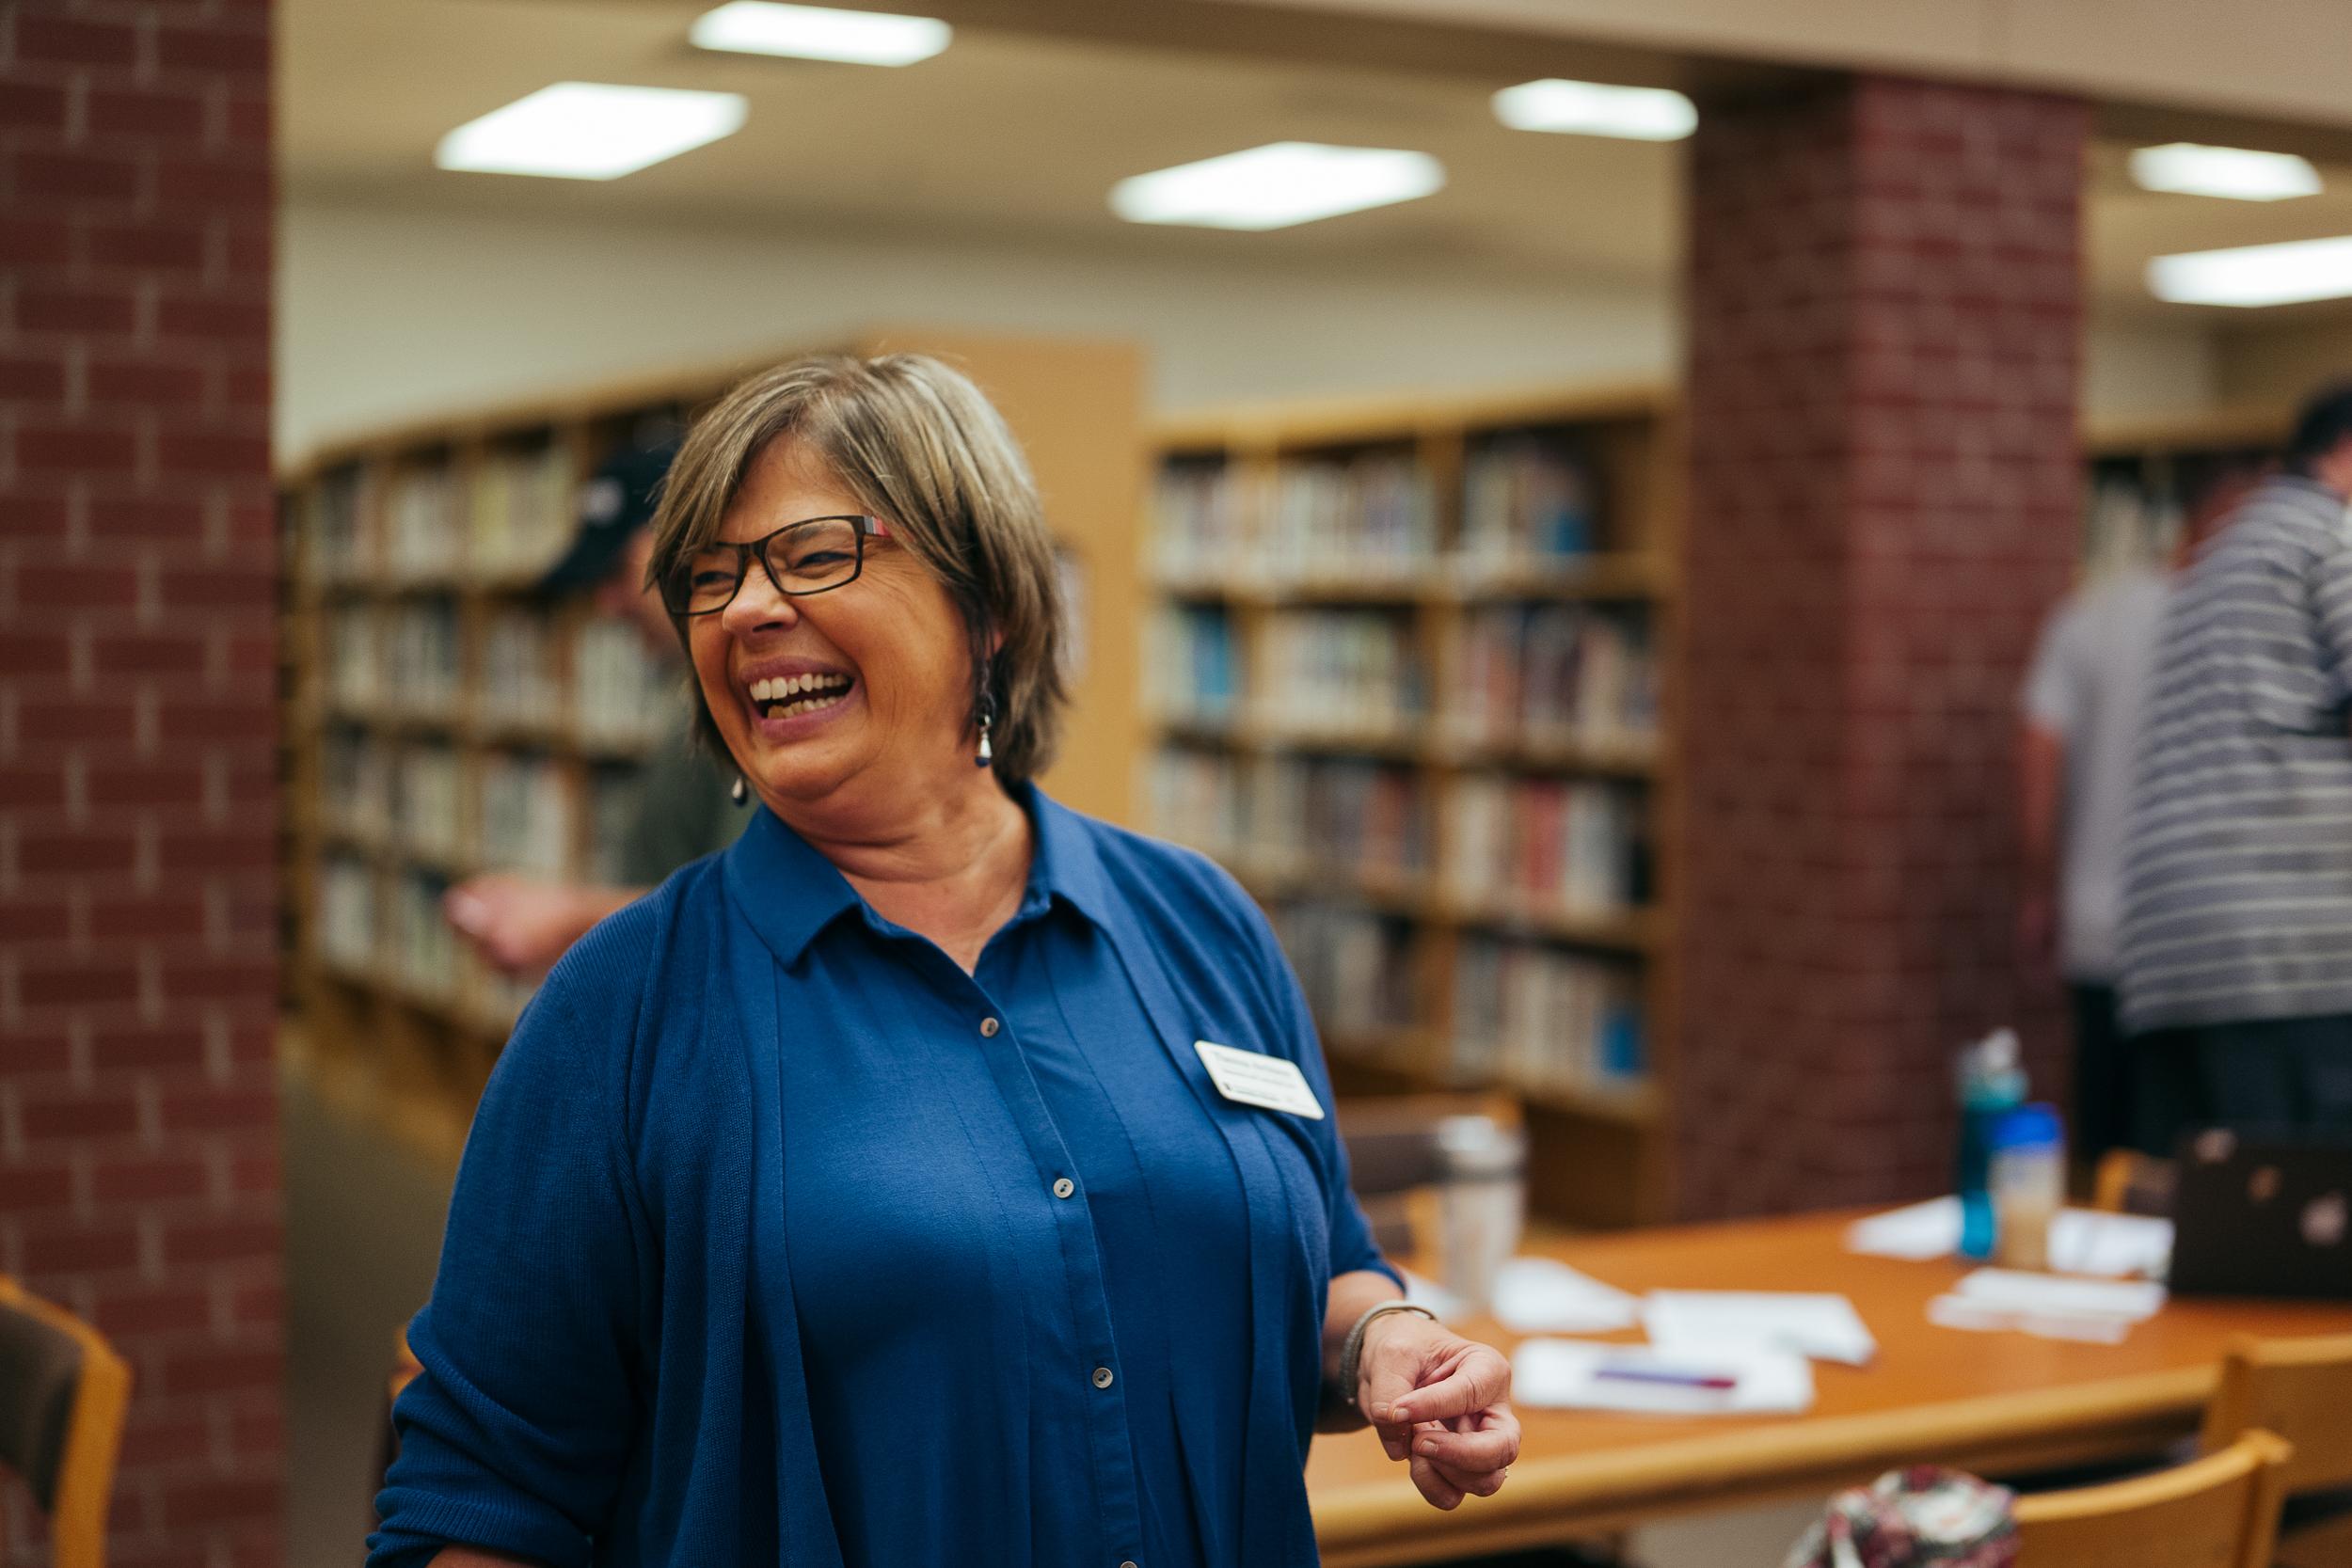 joyful teacher education photography emerging districts ©2019abigailbobophotography-13.jpg